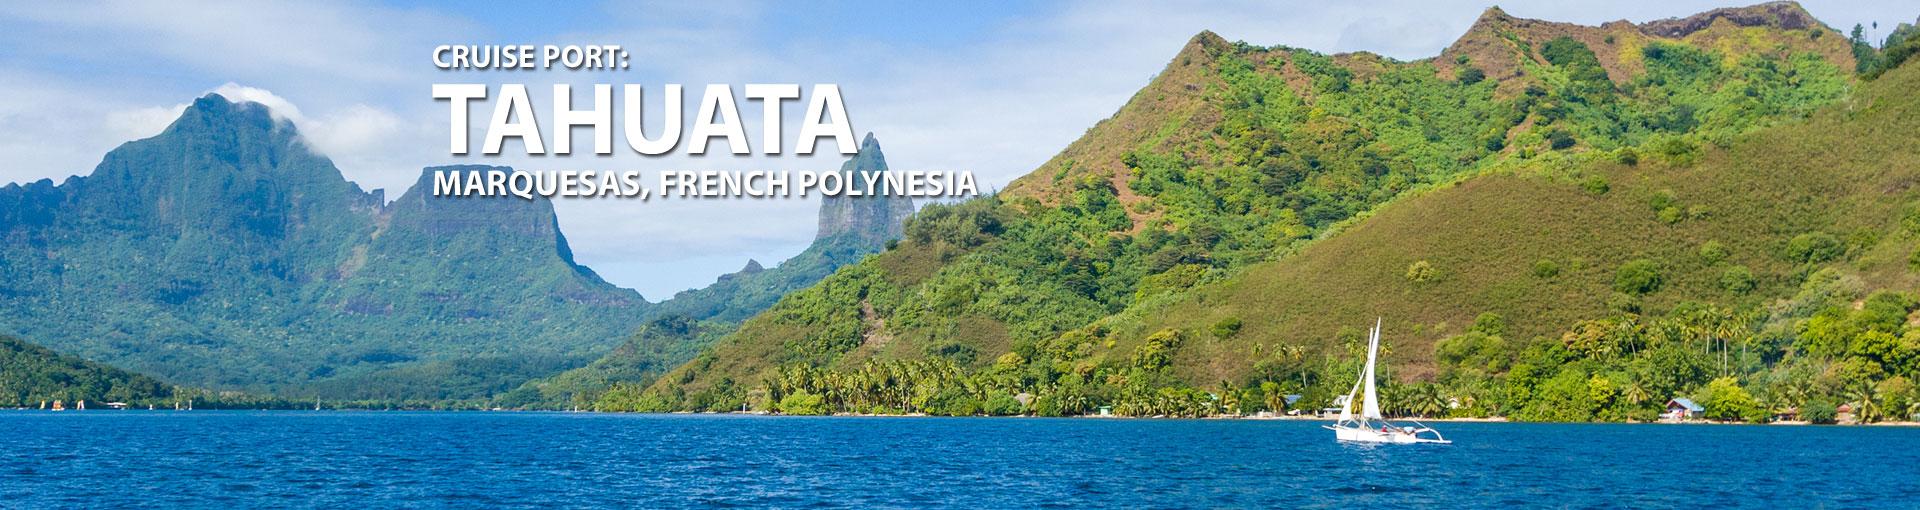 Cruises to Tahuata, Marquesas, French Polynesia